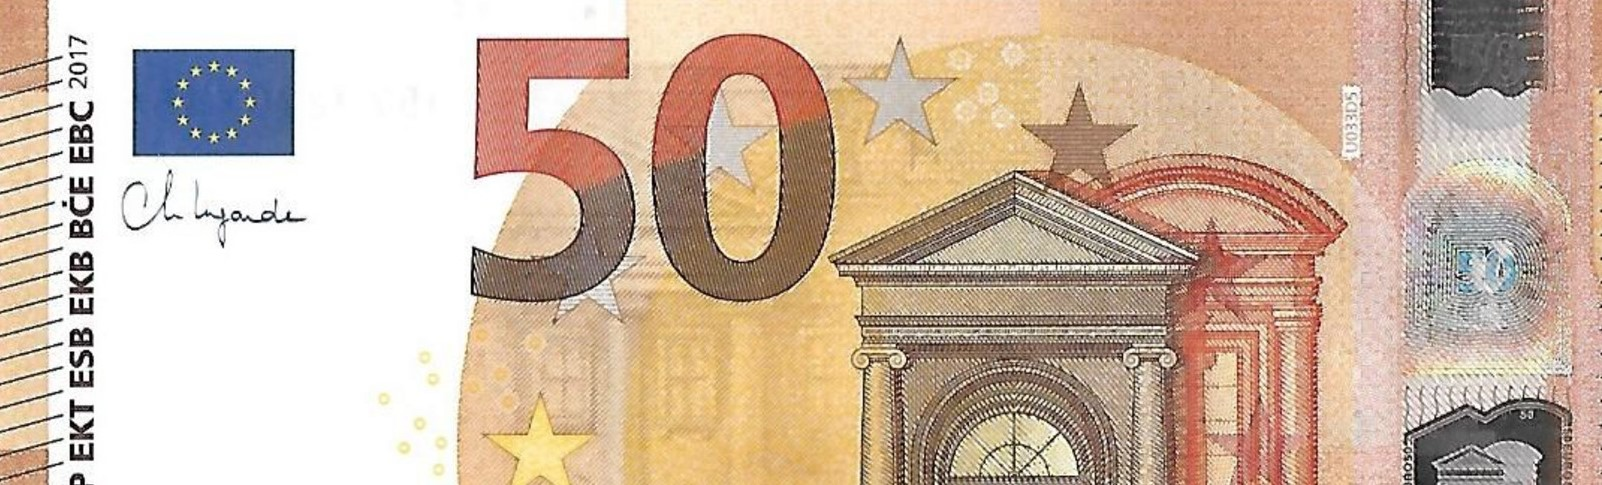 50 U U 033 Lagarde - Collection EUROPE